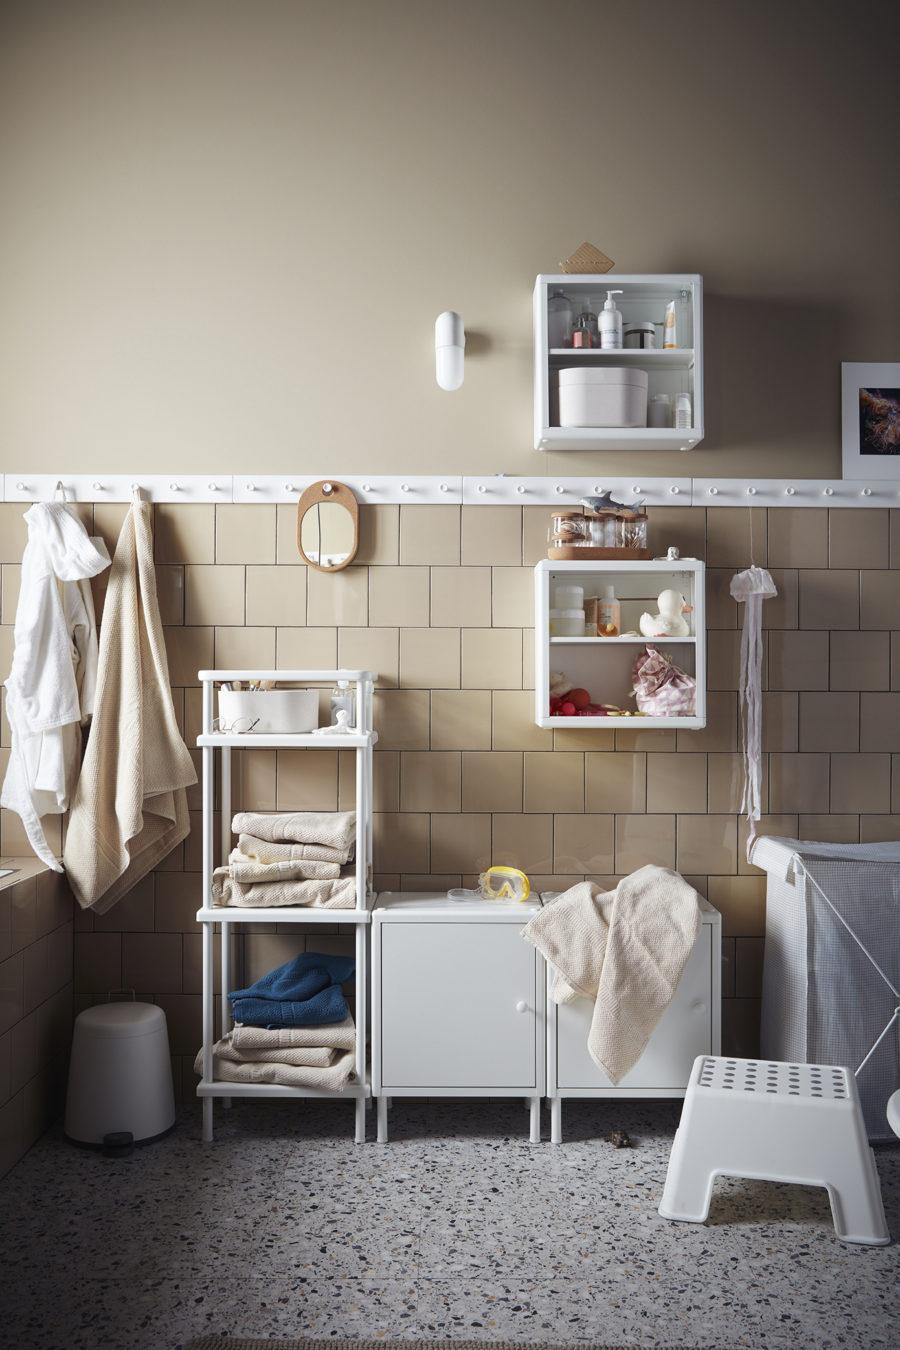 Catálogo Ikea - almacenamiento extra